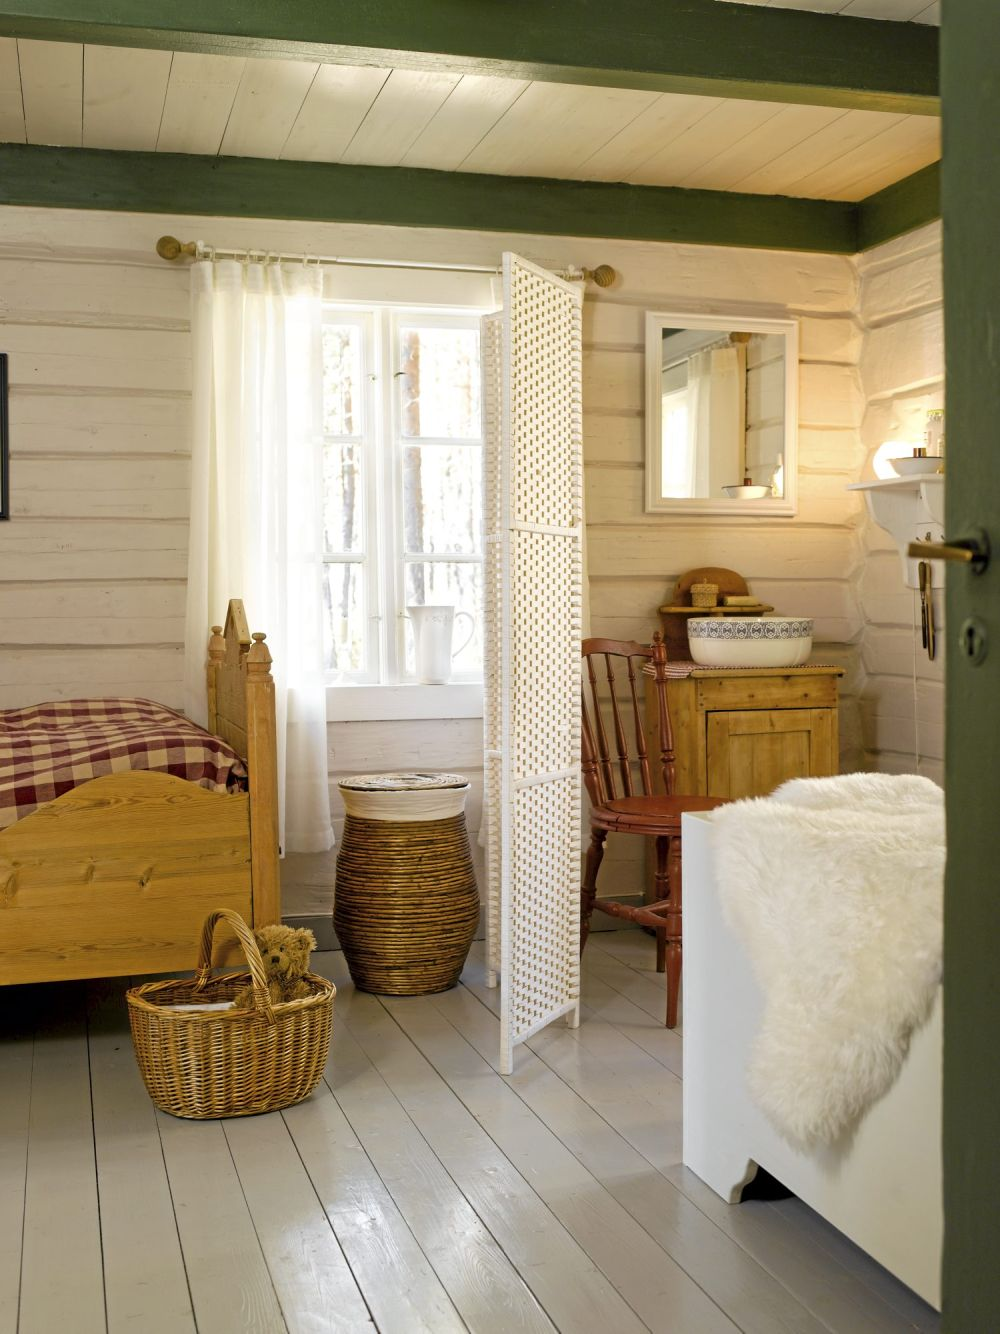 adelaparvu.com despre cabana in padure cu interior romantic, Foto Erik Jæger